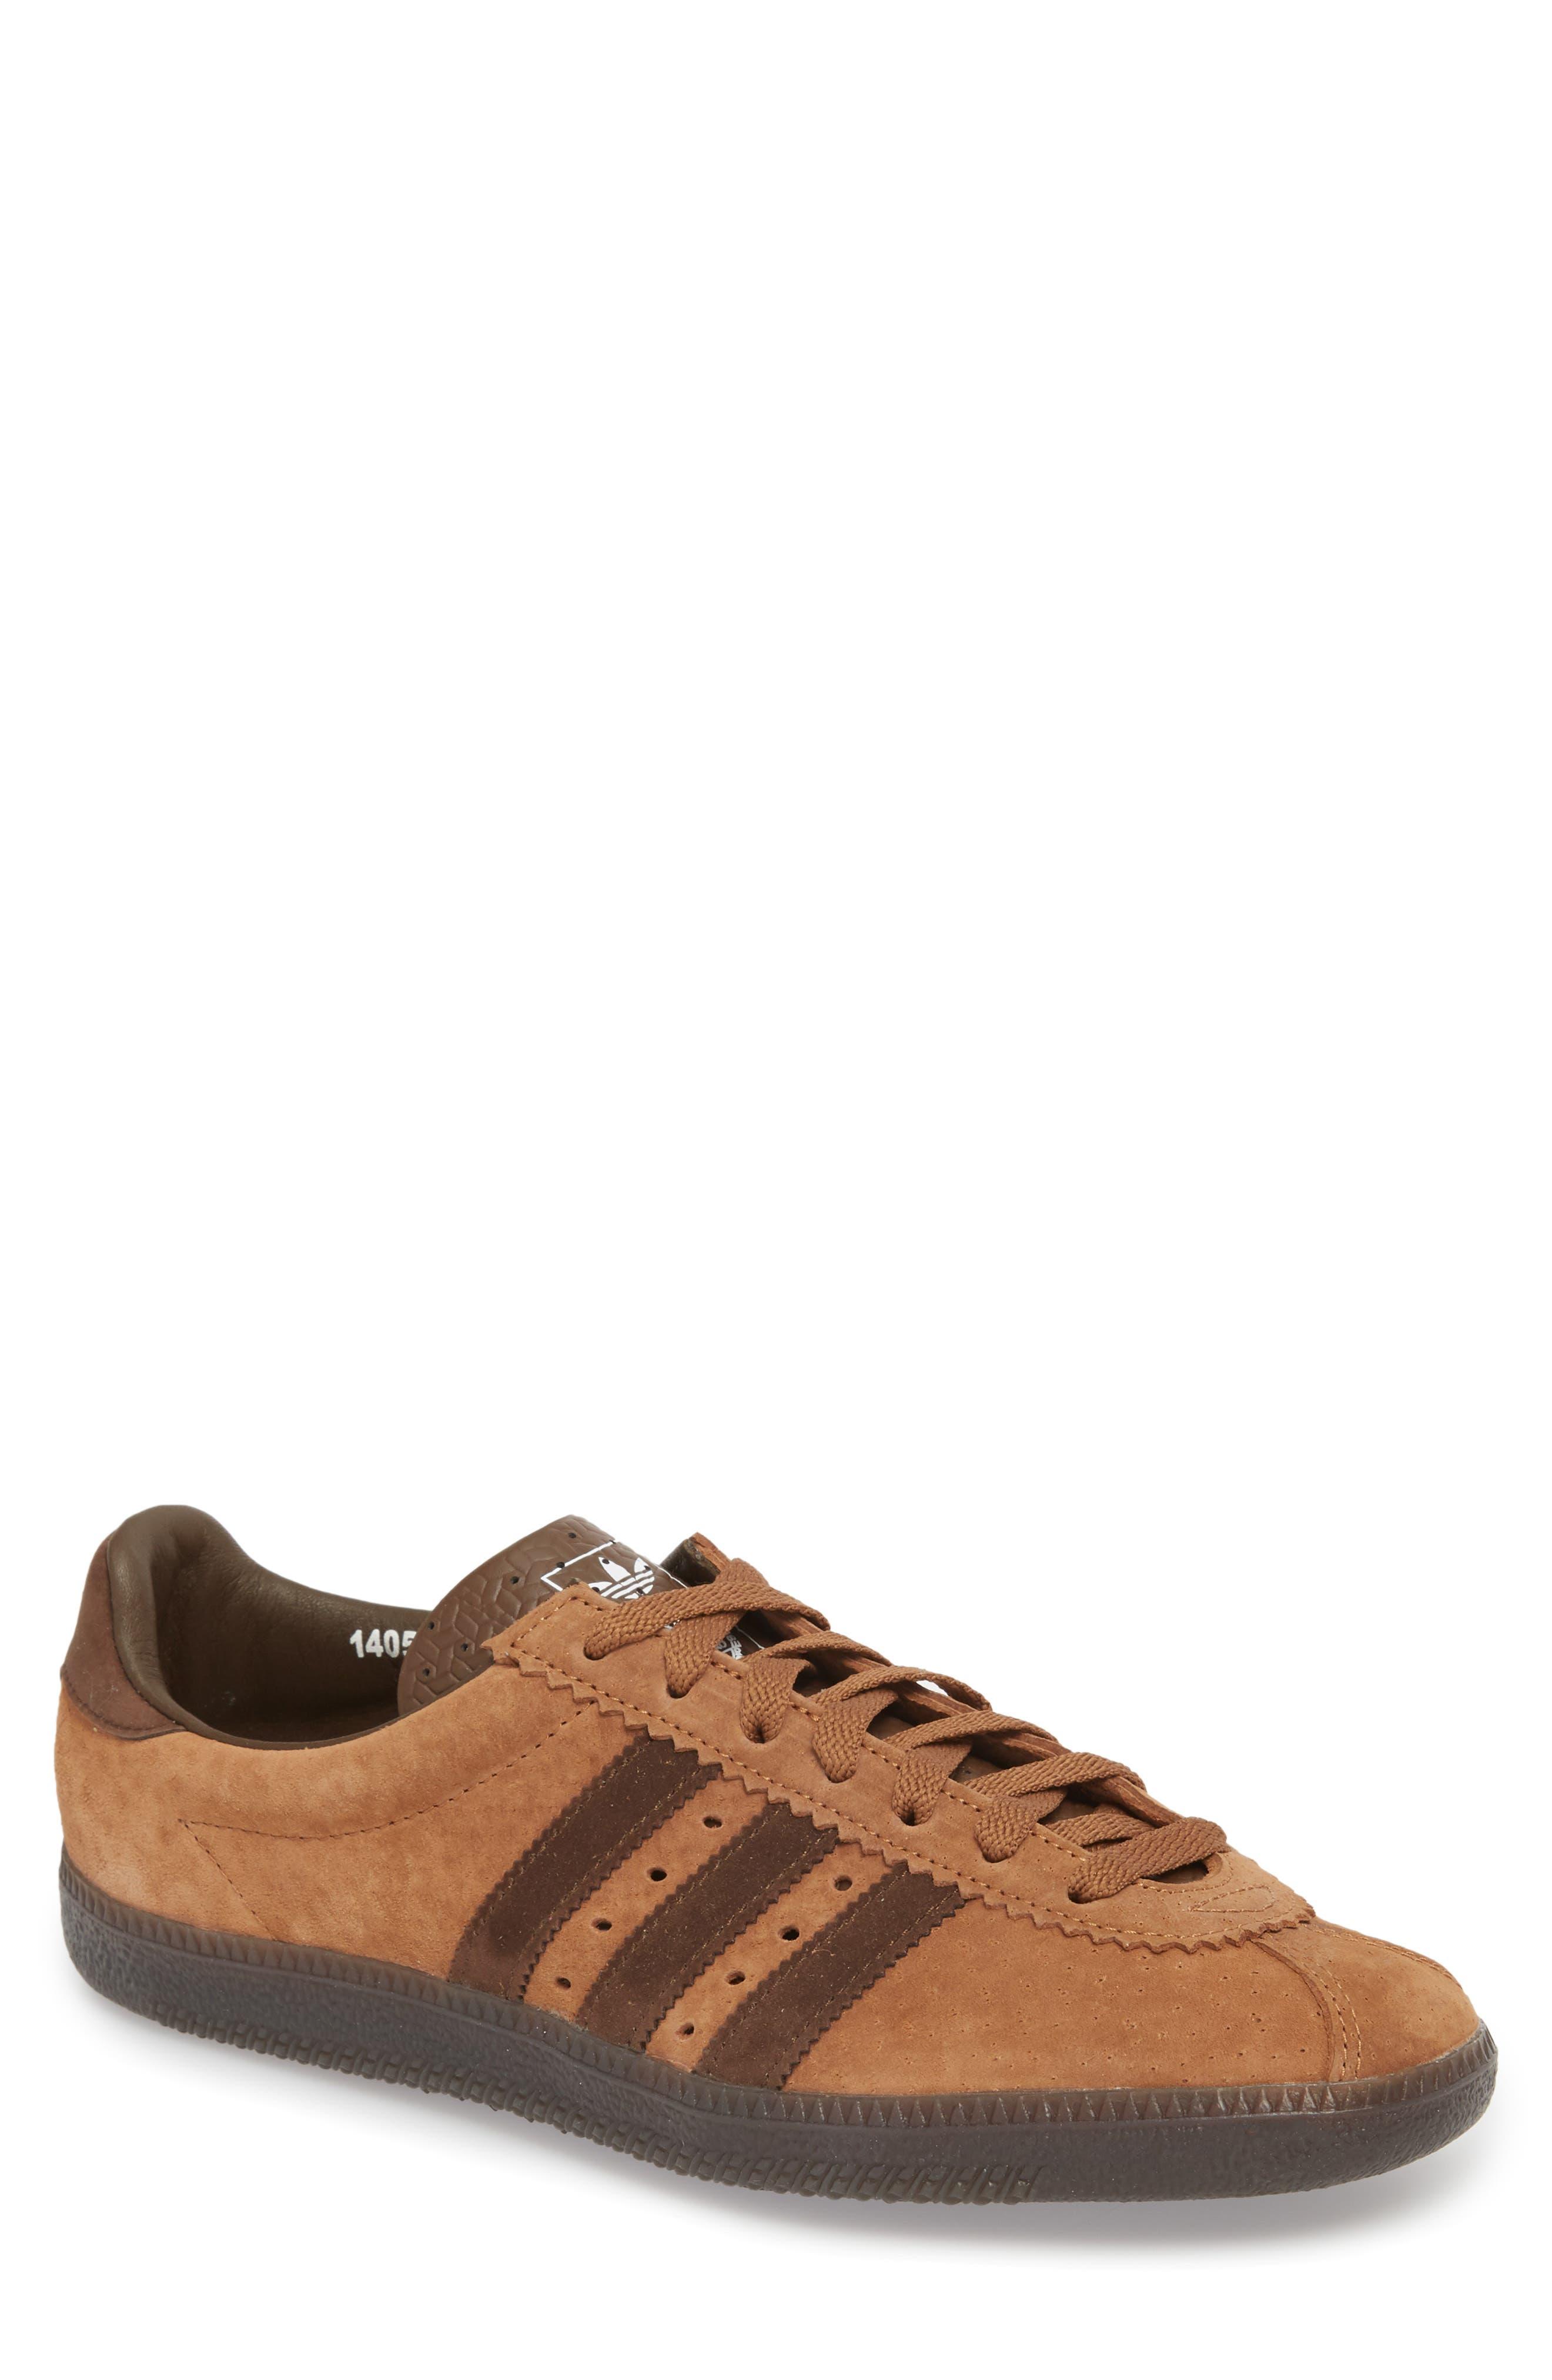 Padiham SPZL Sneaker,                         Main,                         color, 200